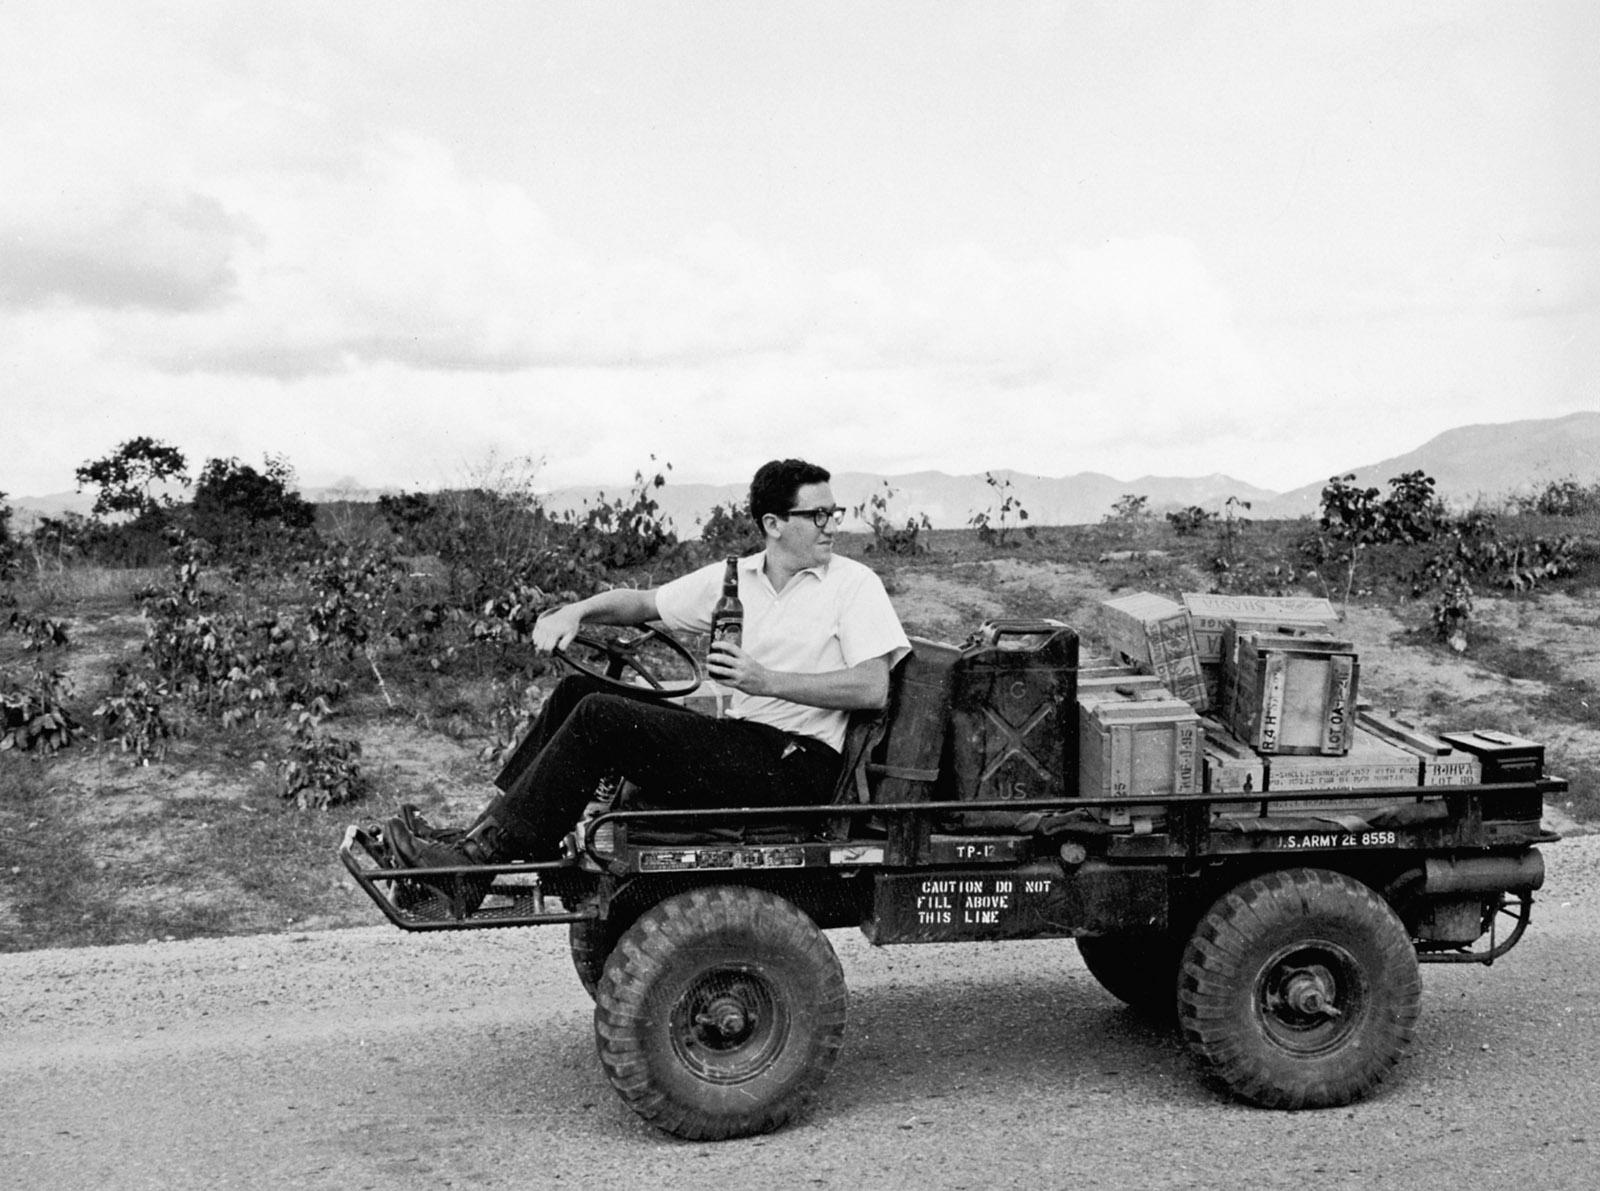 Richard Holbrooke in South Vietnam, 1960s